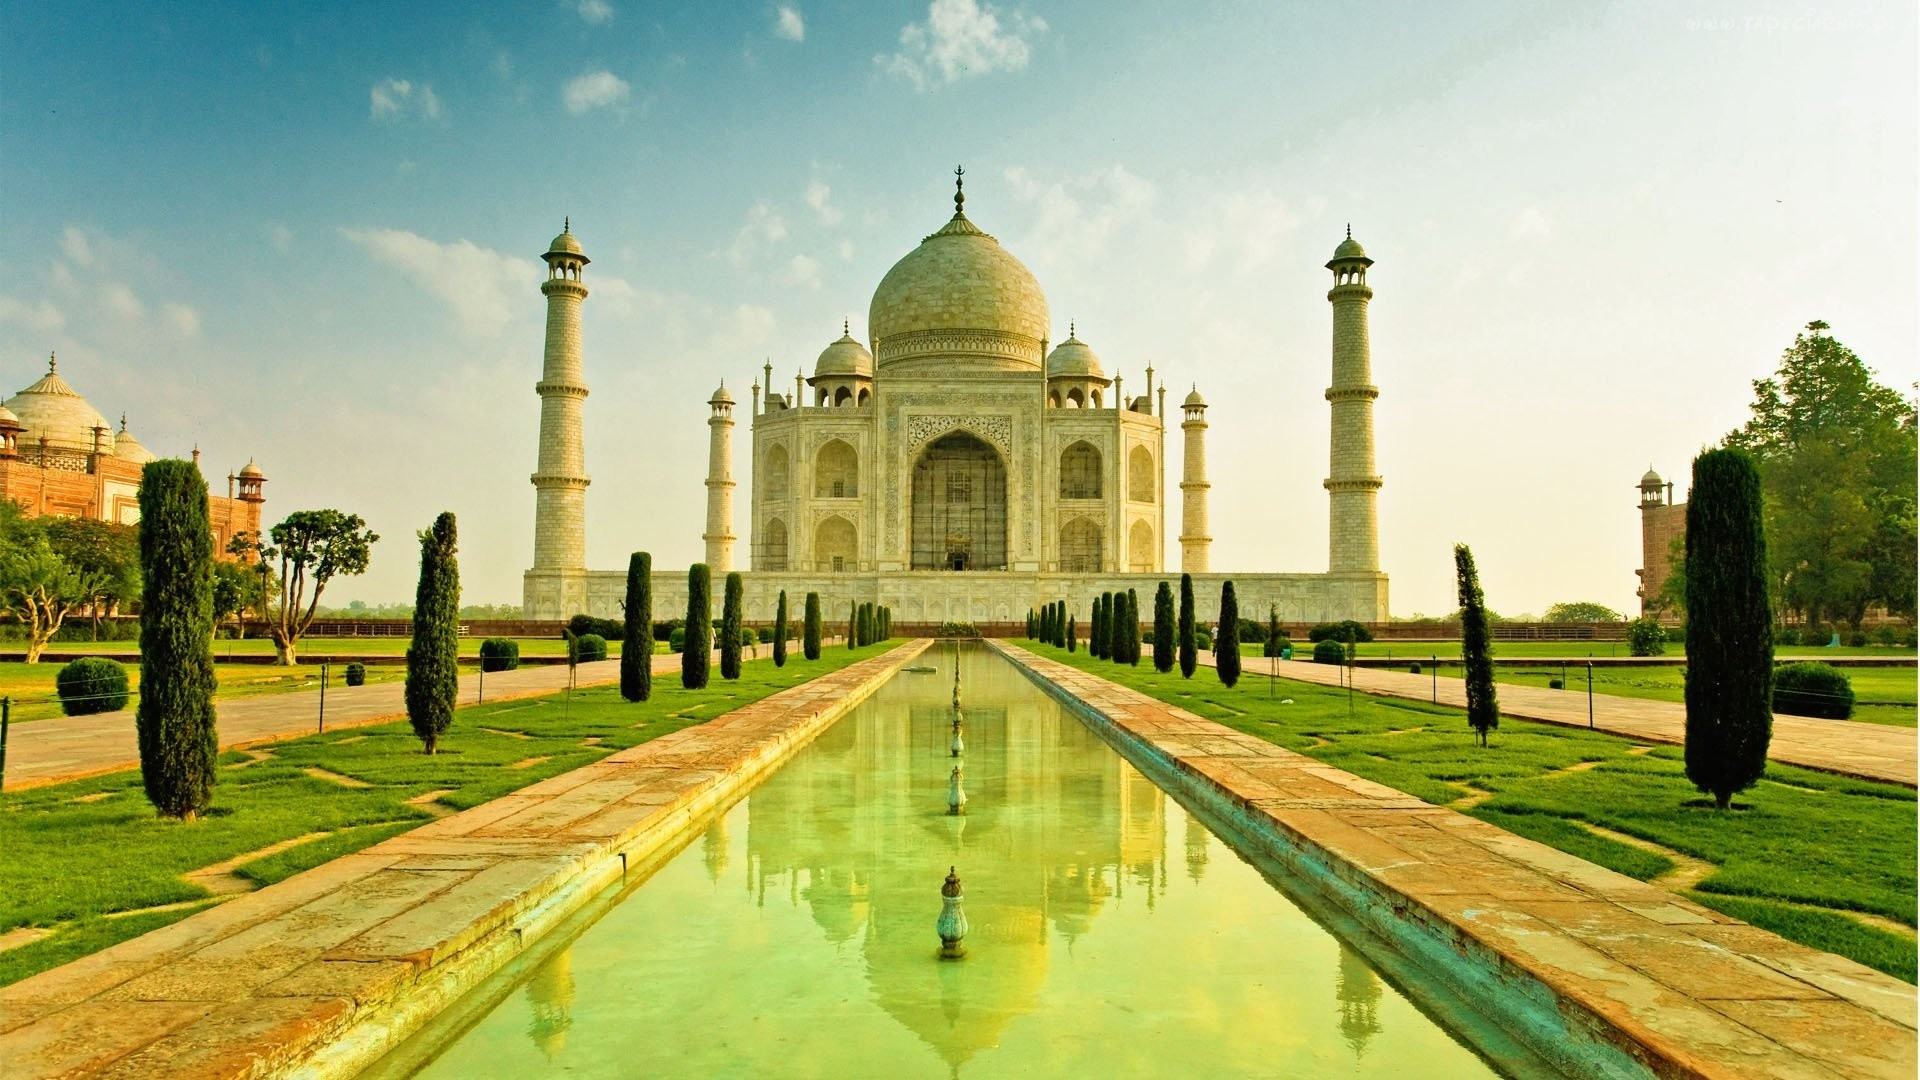 28838 скачать обои Архитектура, Тадж Махал (Taj Mahal) - заставки и картинки бесплатно